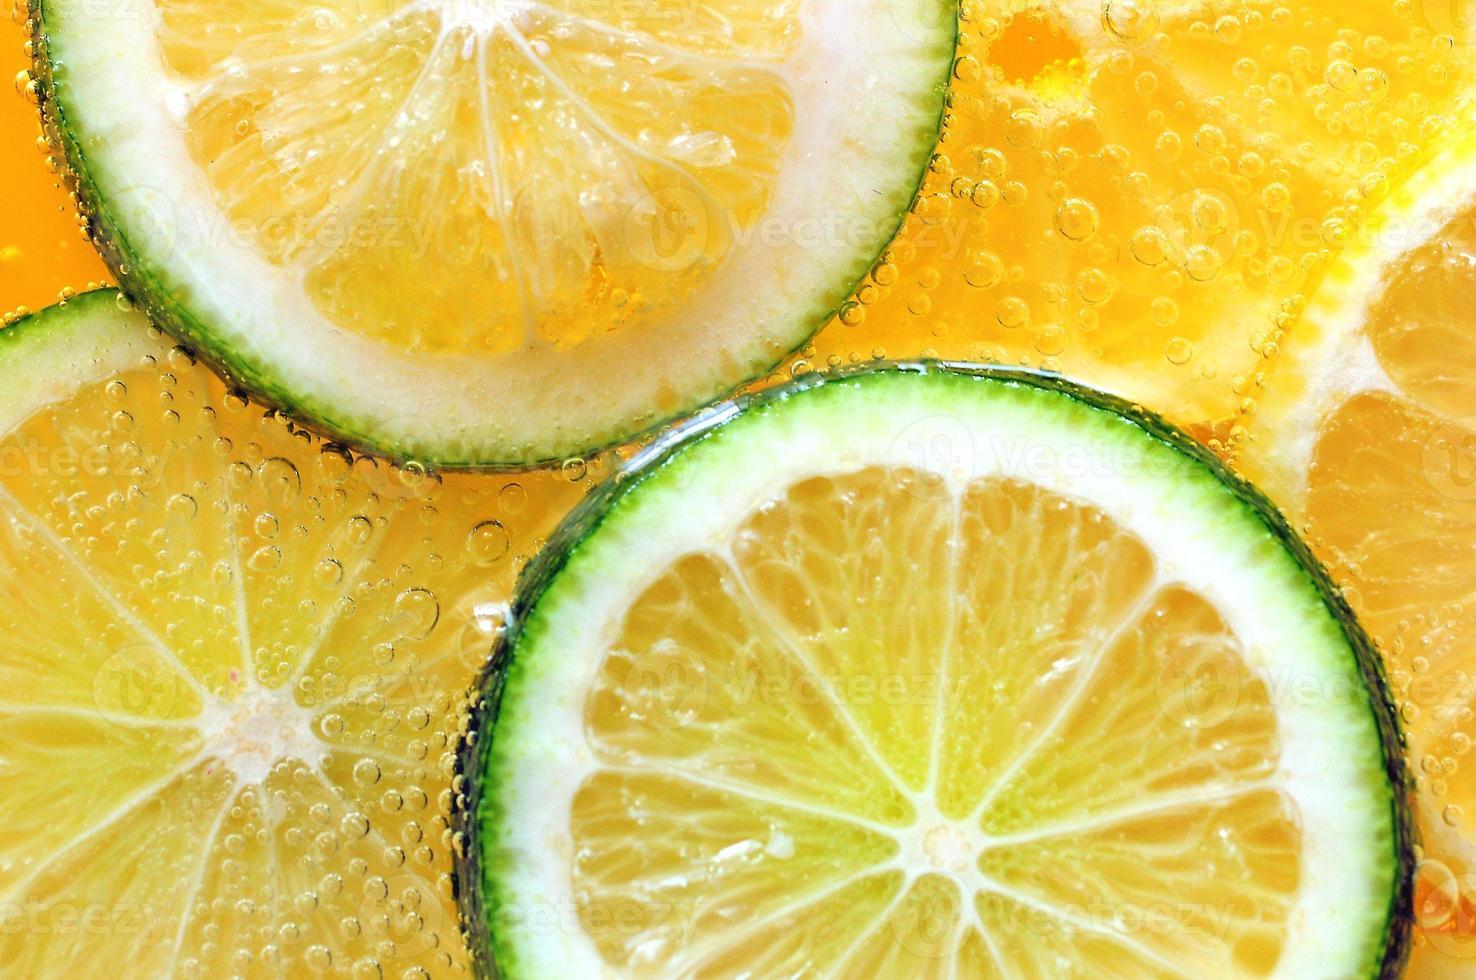 Citrus fruit slices close-up photo